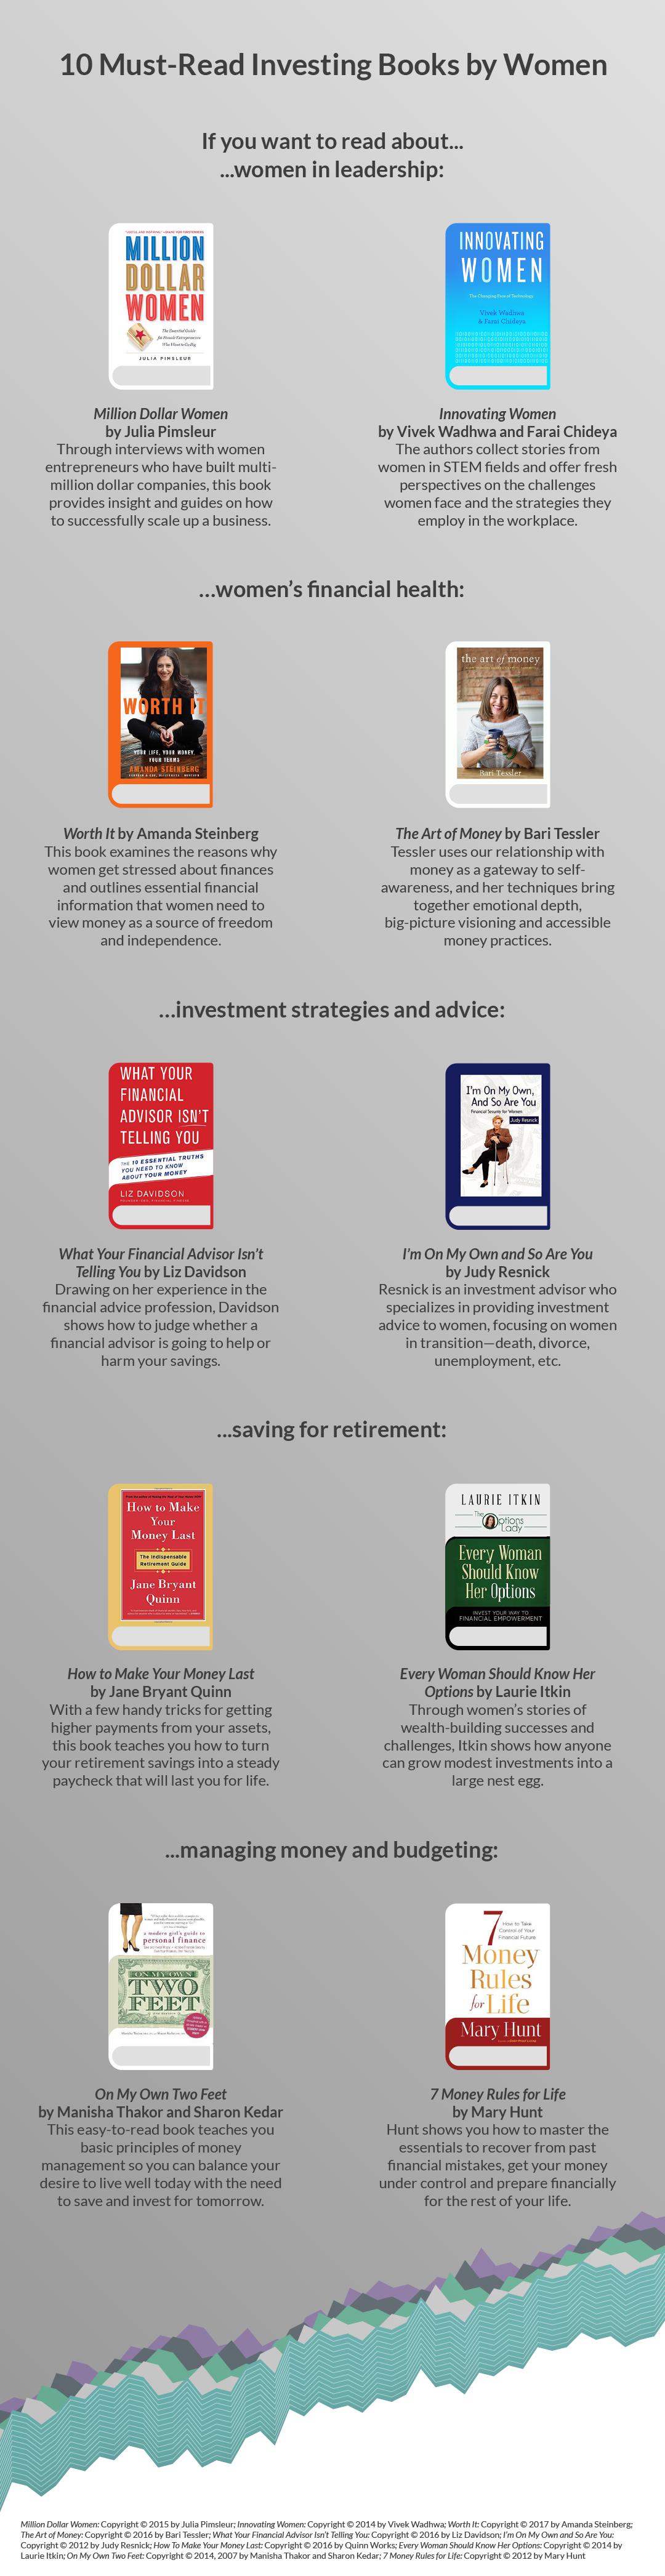 Infographic: Best Finance Books for Women